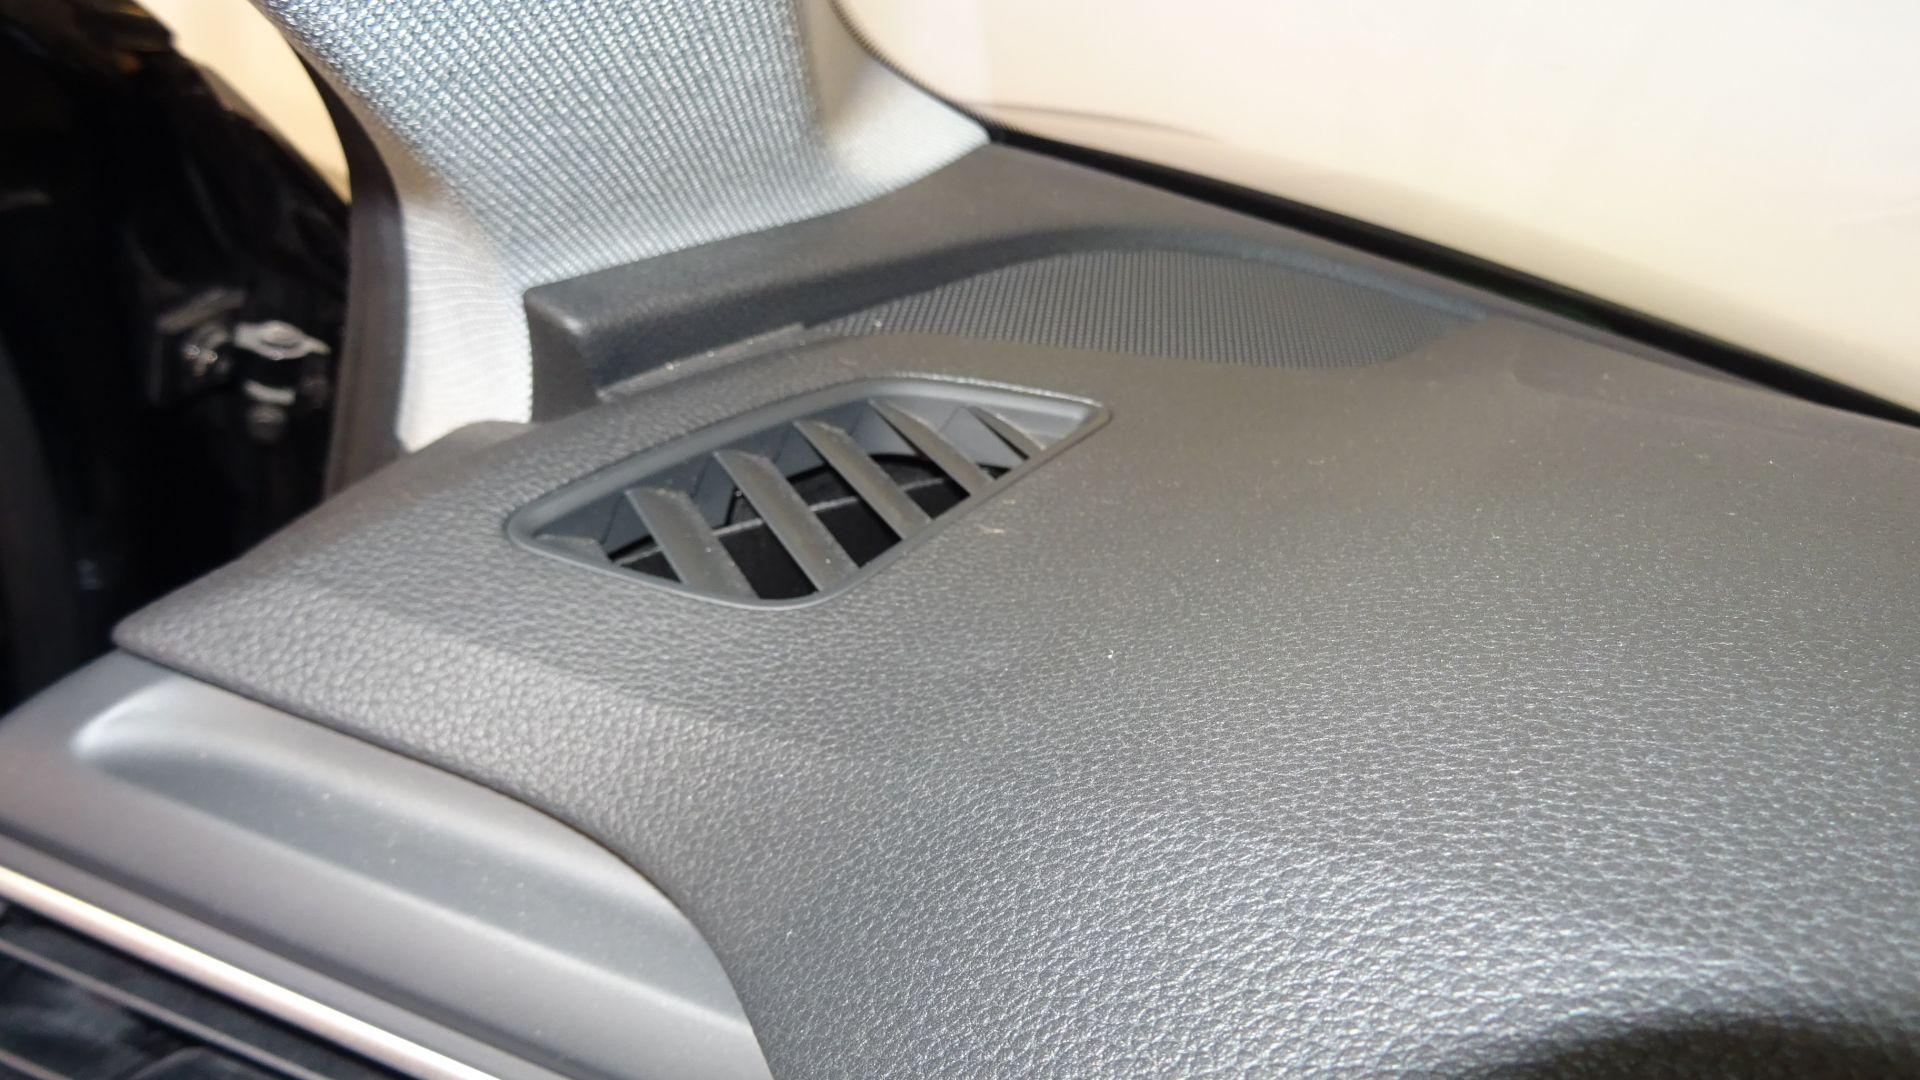 Audi A4 Avant S line 35 TDI 110kW S tronic